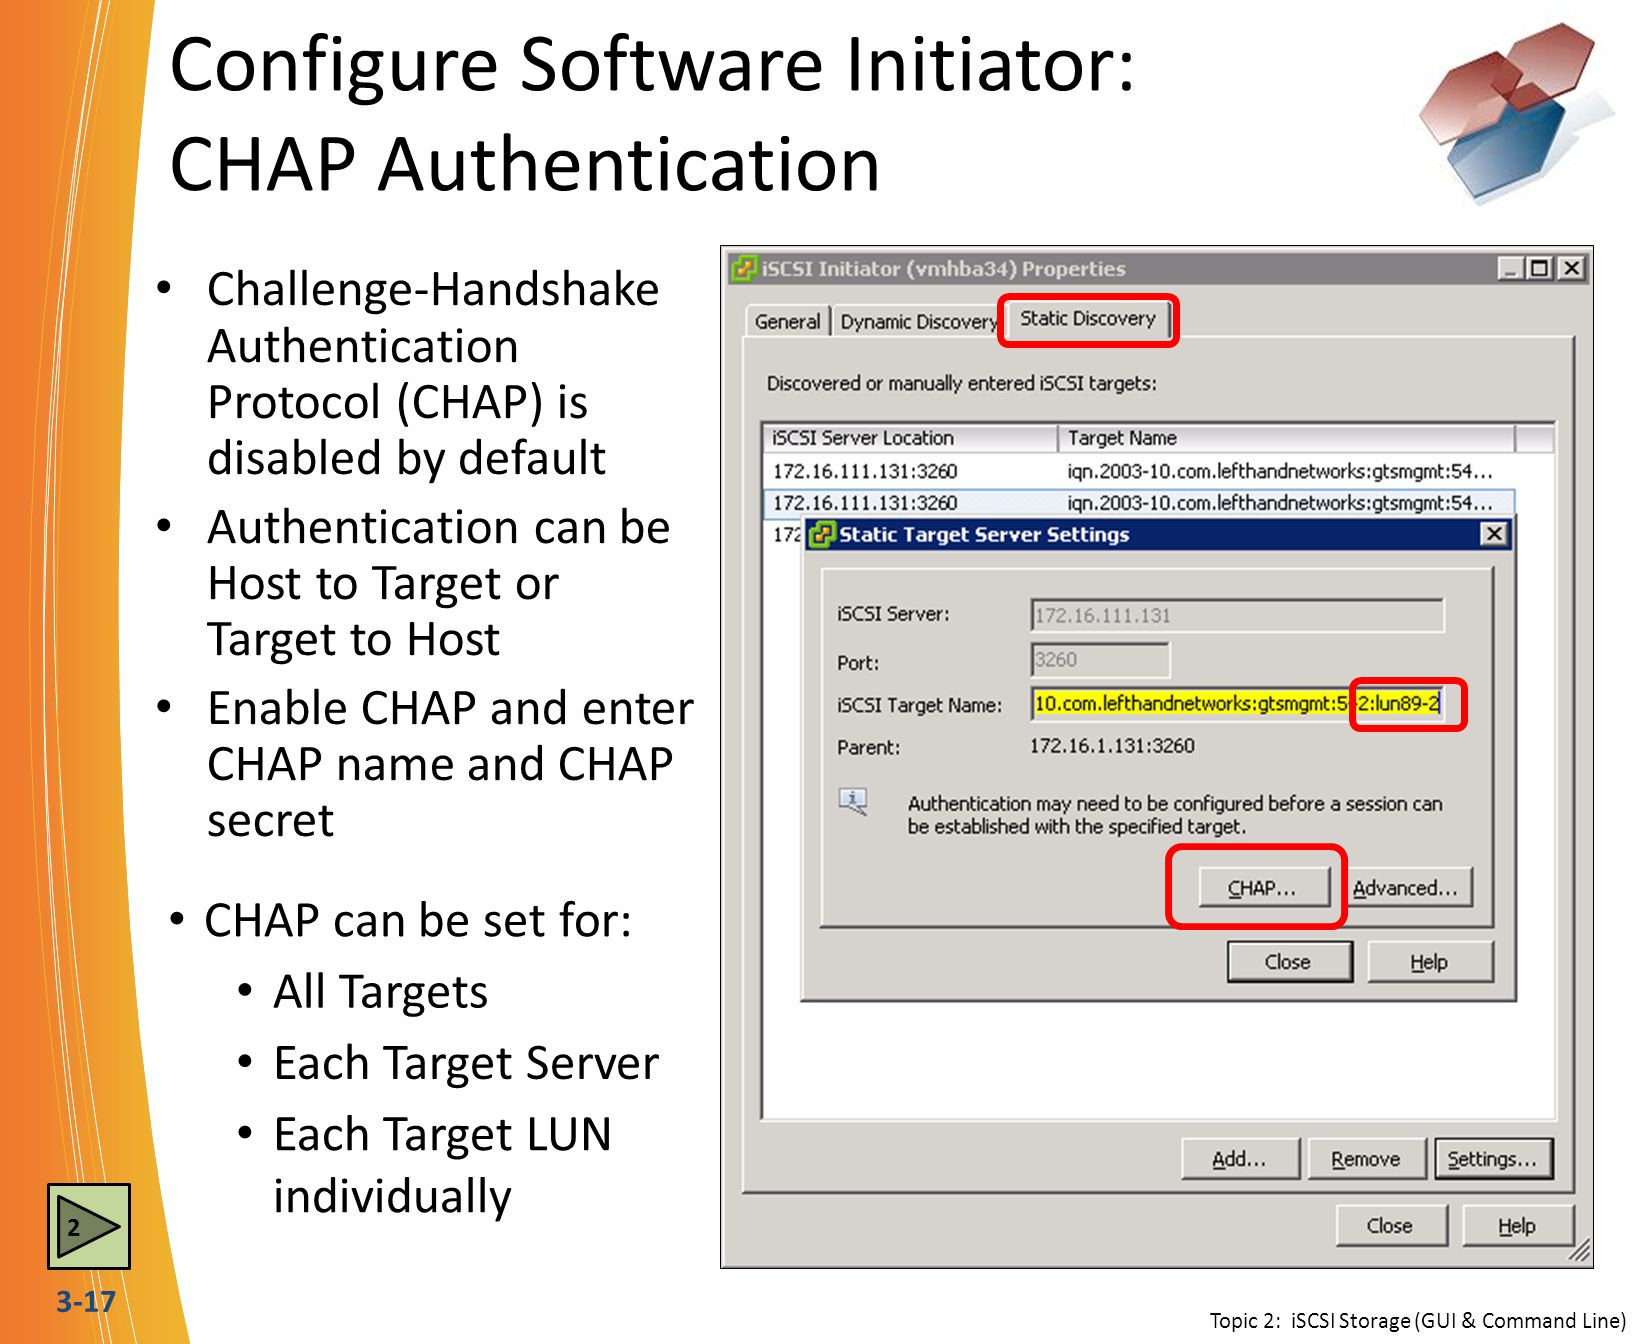 Configure Software Initiator: CHAP Authentication